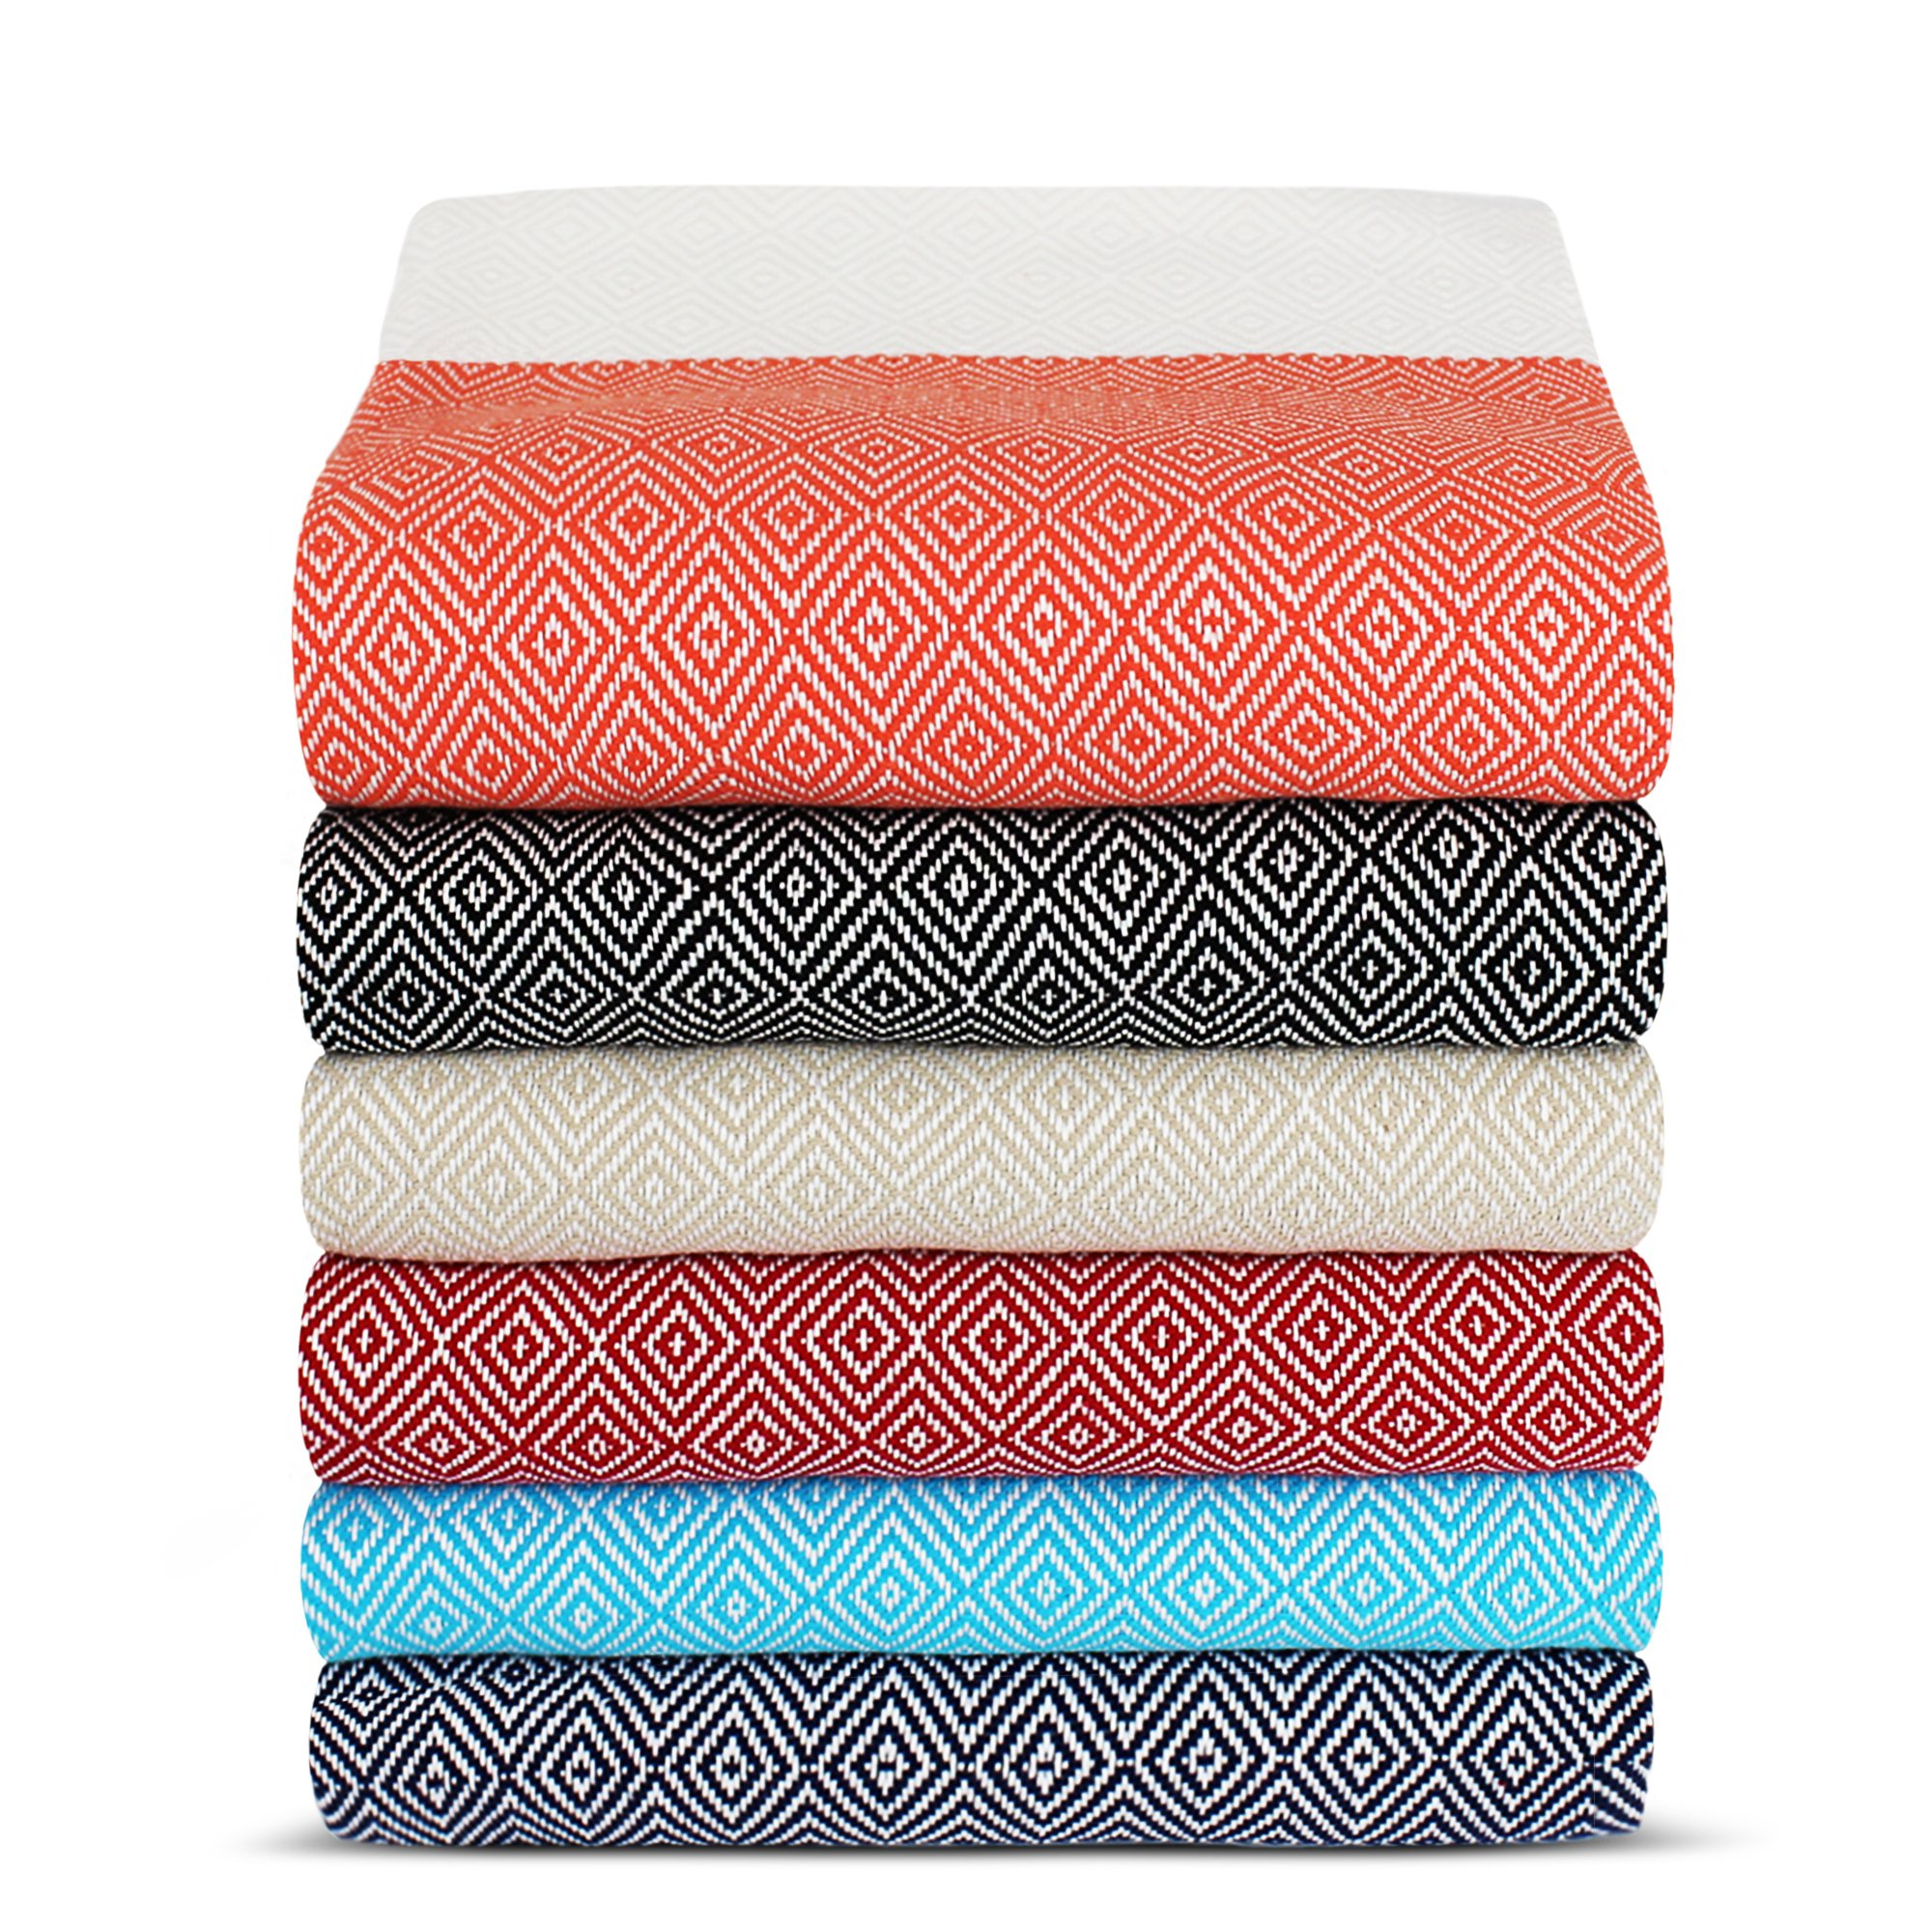 Turkuoise Peshtemal - Set of 4 - Genuine Flat Woven Turkish Towel - Pareo - Sarong - Picnic Blanket - Yoga Mat - Fouta (100% Cotton) (Diamond-Set of 4(Random Colors))